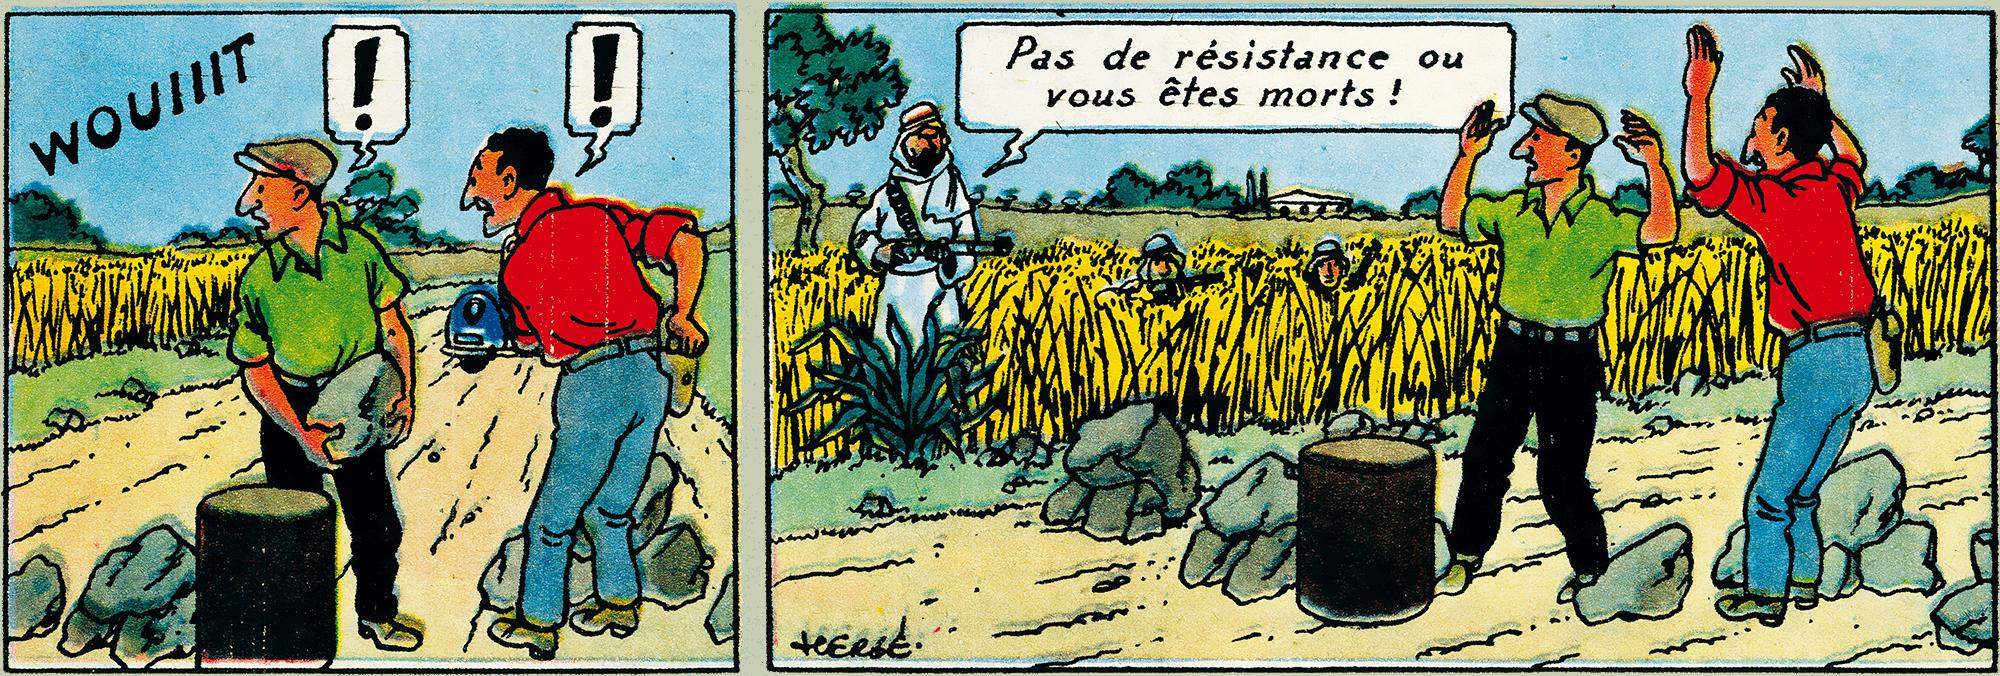 Tintin - Les Aventures de Tintin - Tintin au pays de l'or noir - Le Journal de Tintin